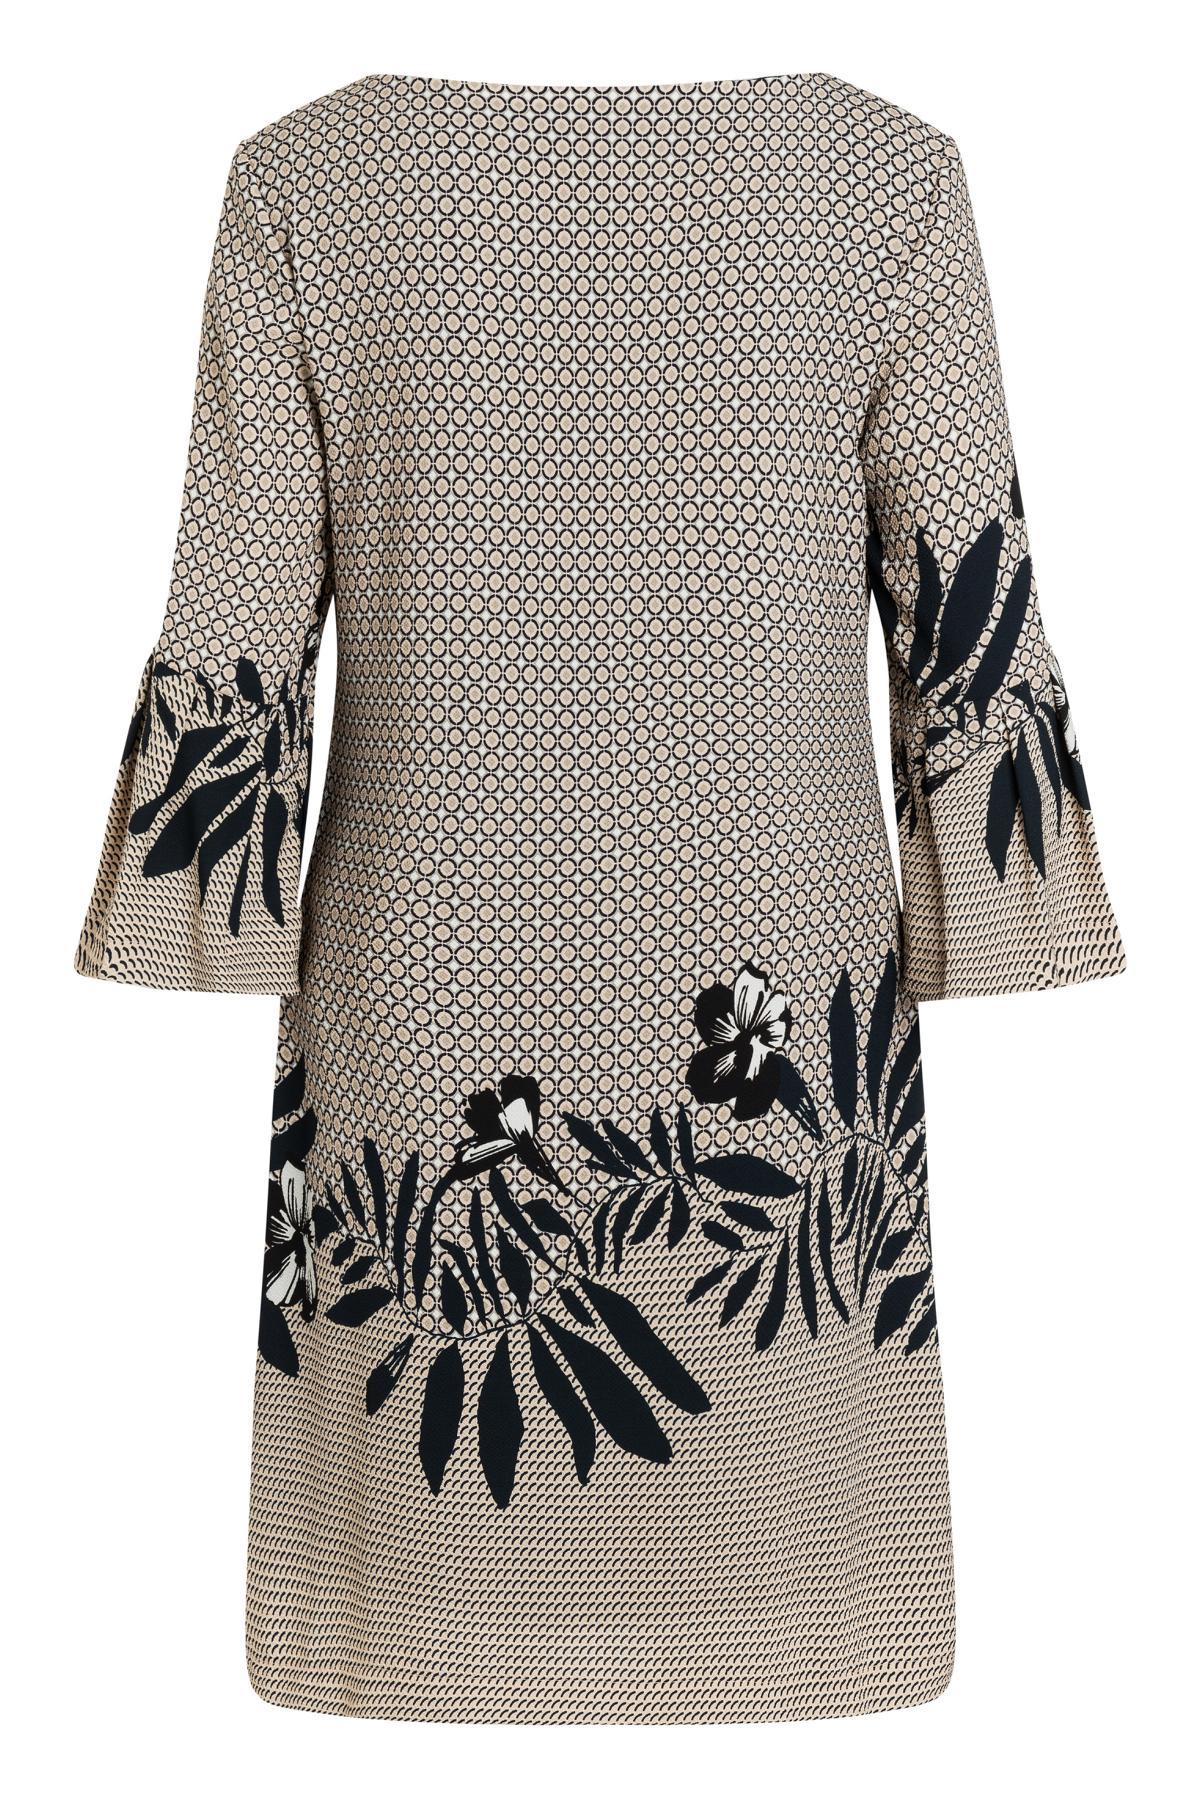 Detailed view 2 of Ana Alcazar Sleeve Dress Serone